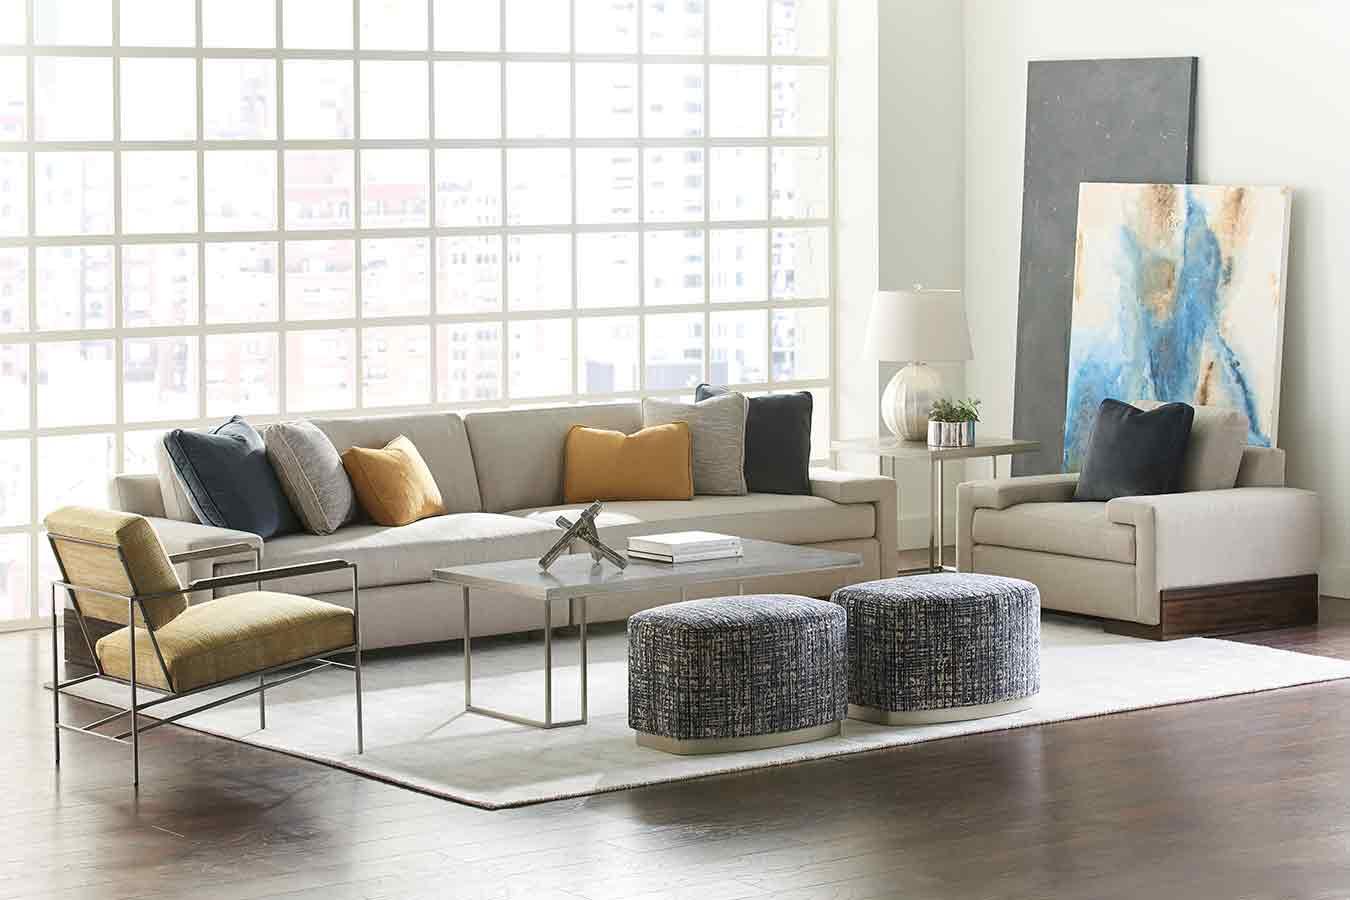 Living Room Sectional Sofa   Contemporary Luxury Exclusive Designer Furniture   Johannesburg